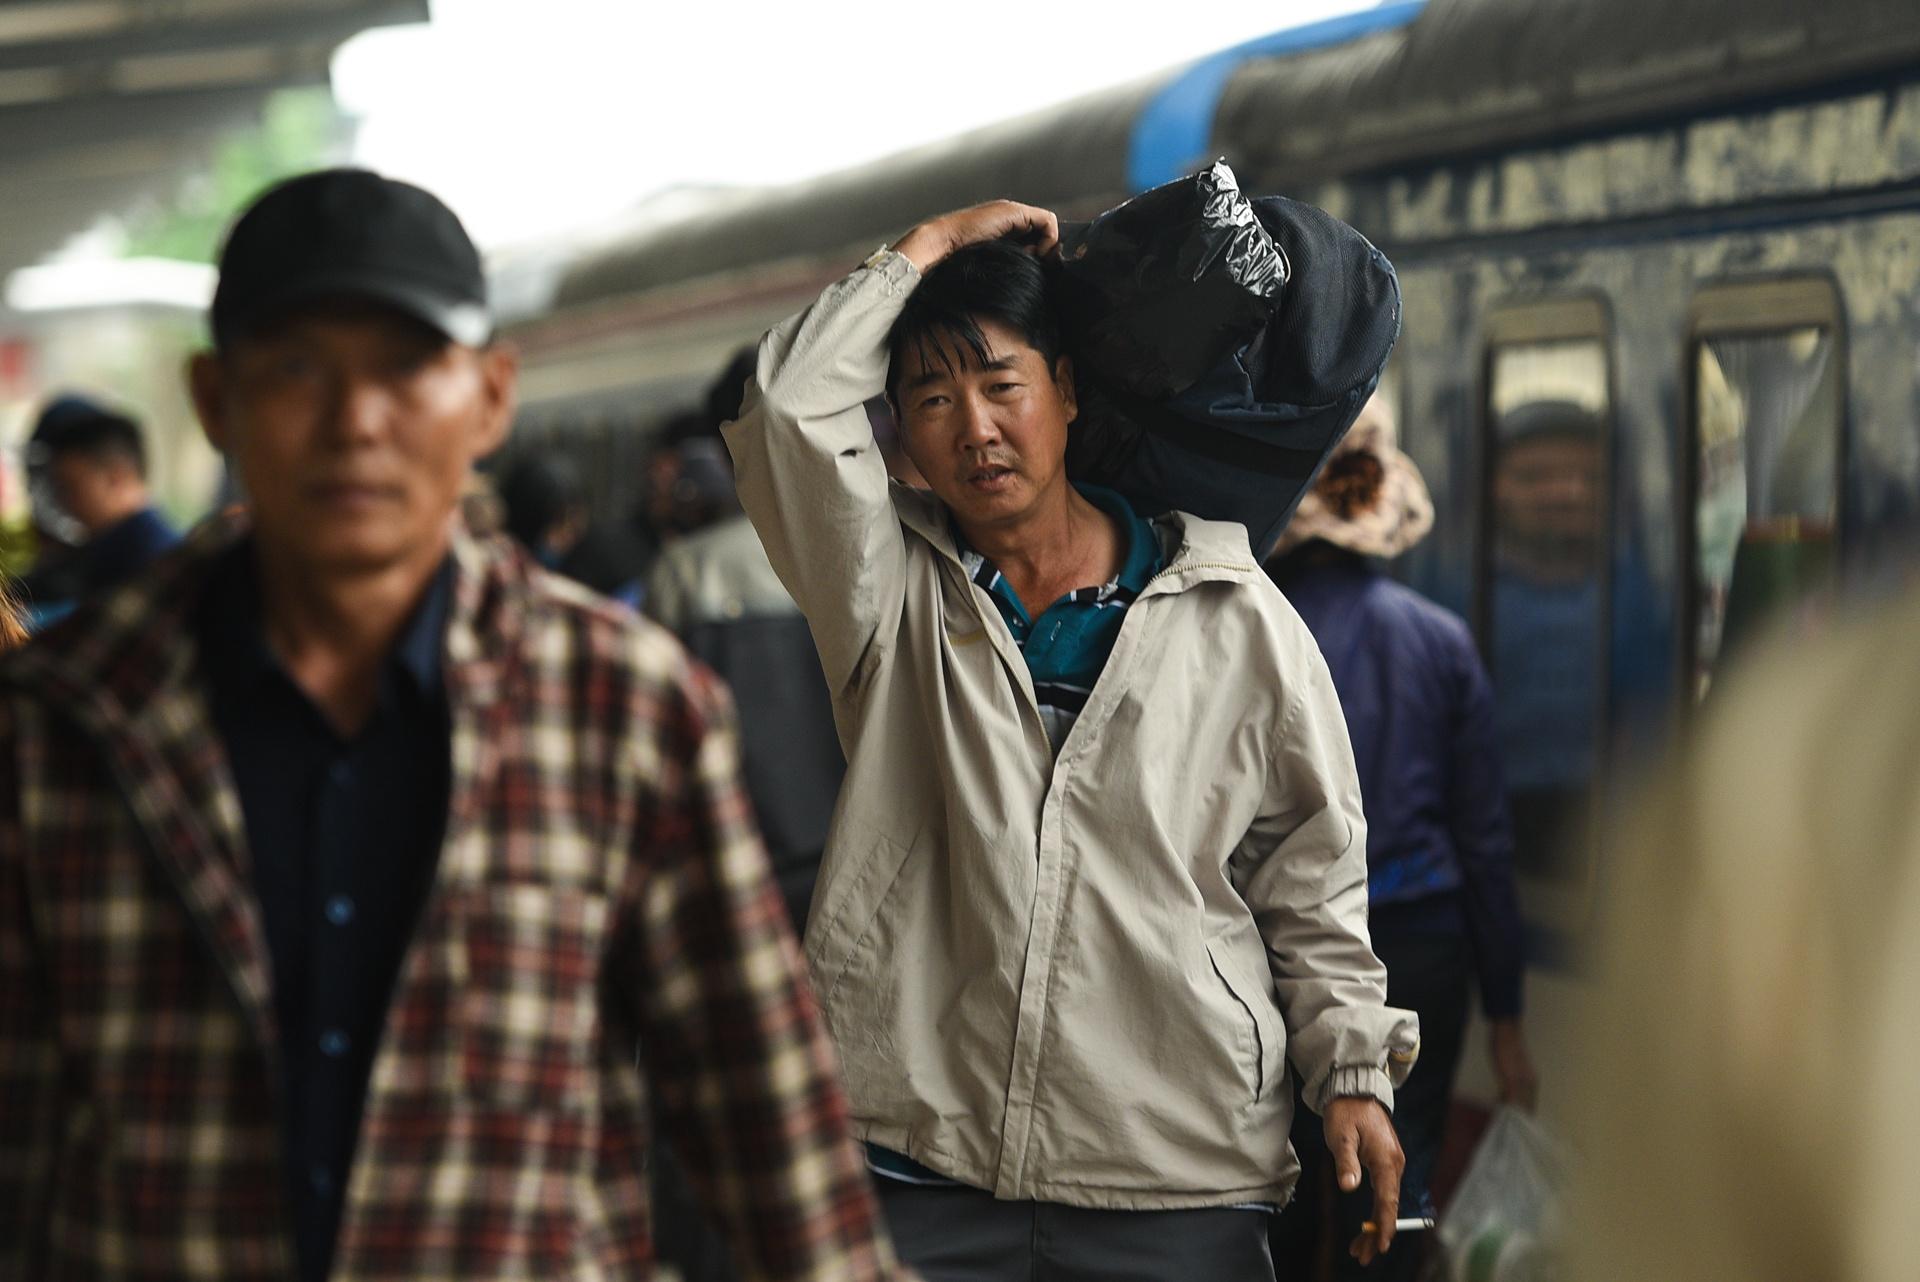 Tet tren nhung chuyen tau cuoi cung cua nam Ky Hoi hinh anh 4 DSC_1367_zing.jpg